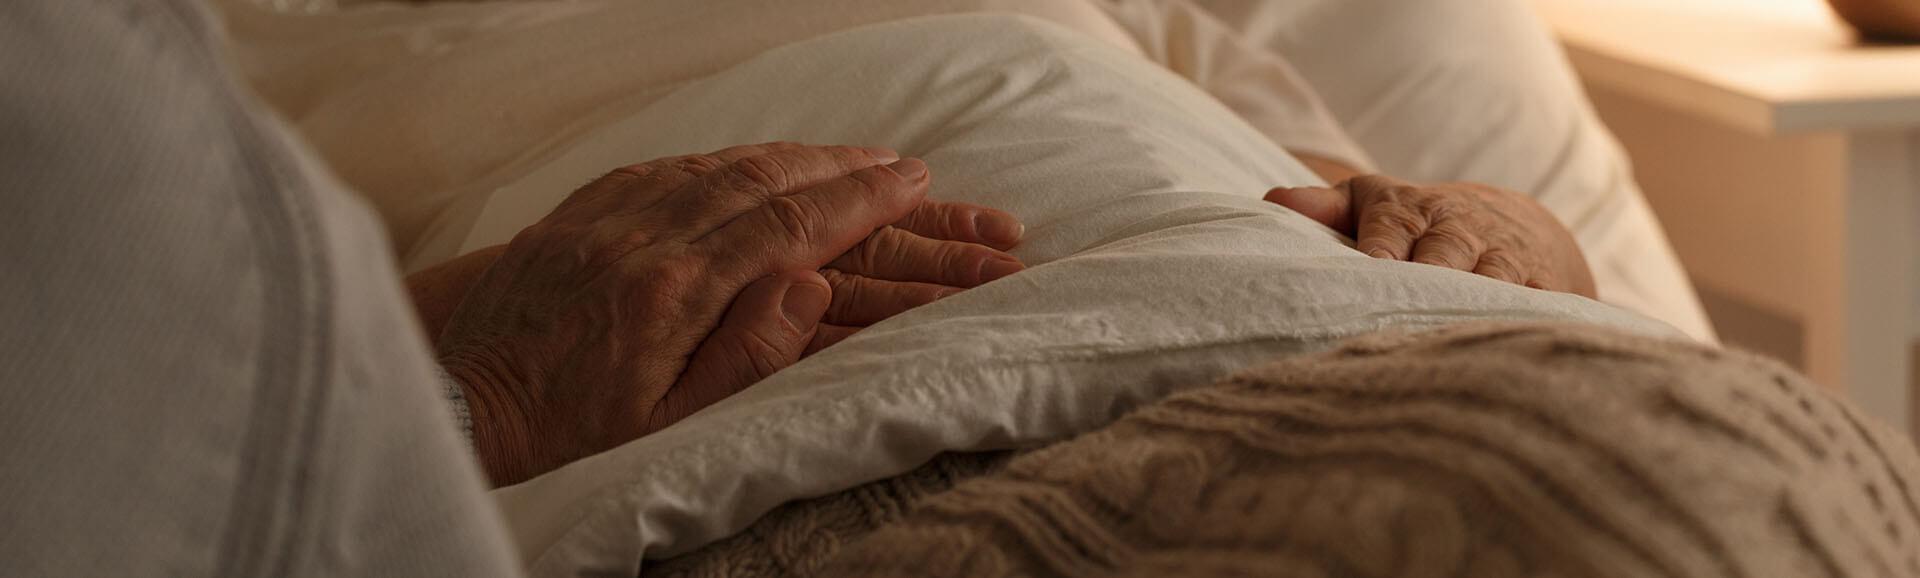 Senior man comforting his wife